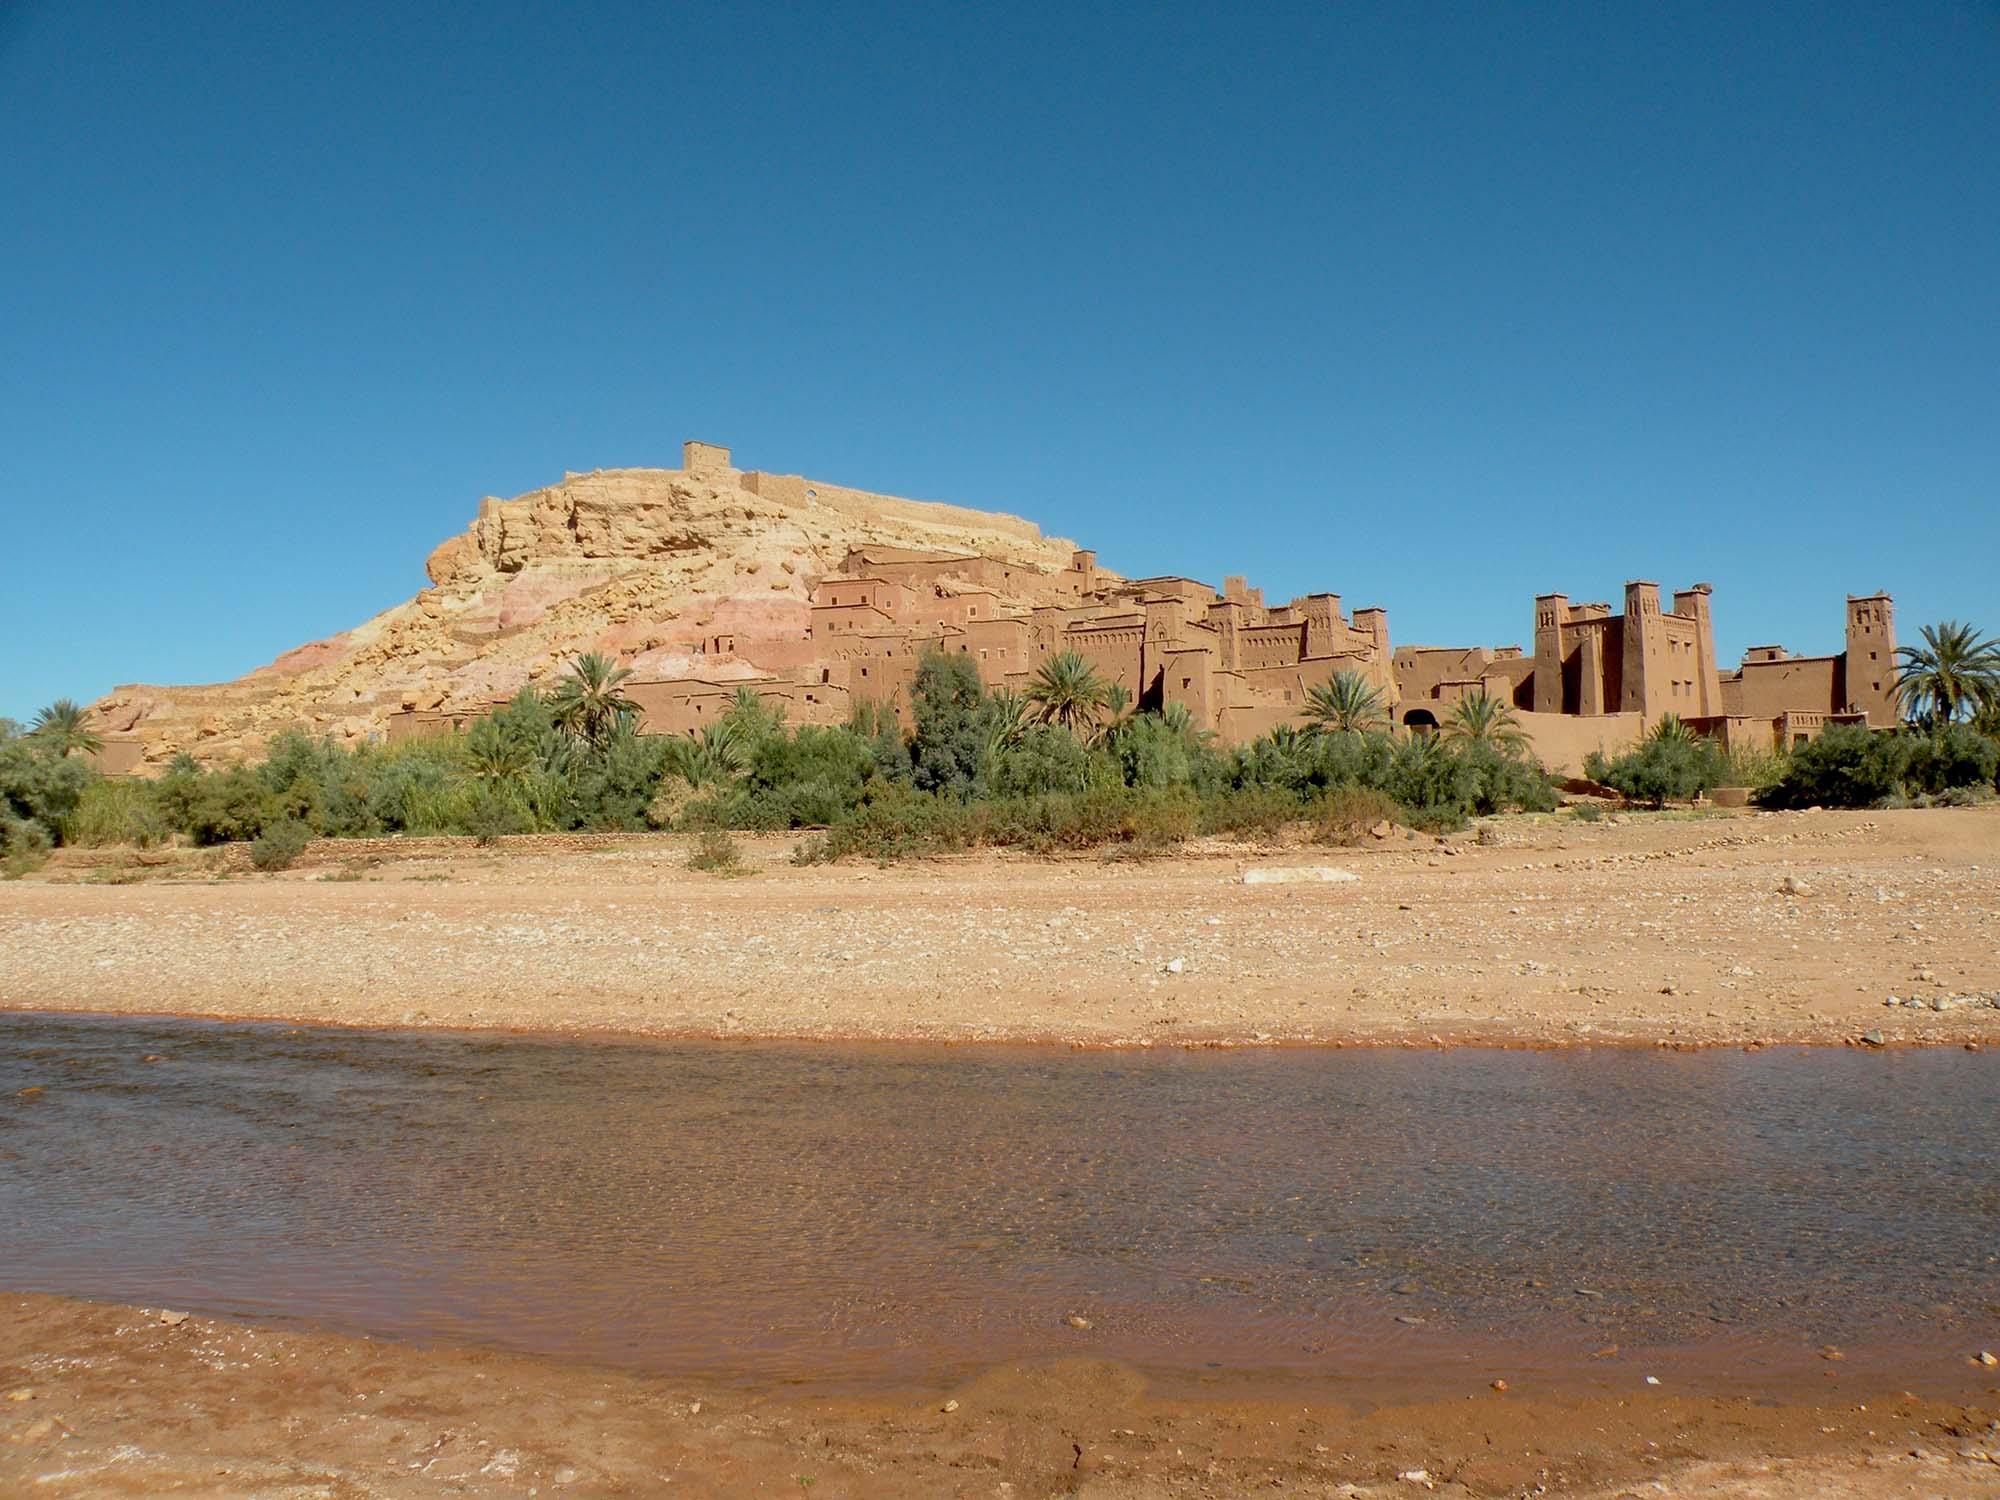 Africa - Marocco - Ait Benhaddou